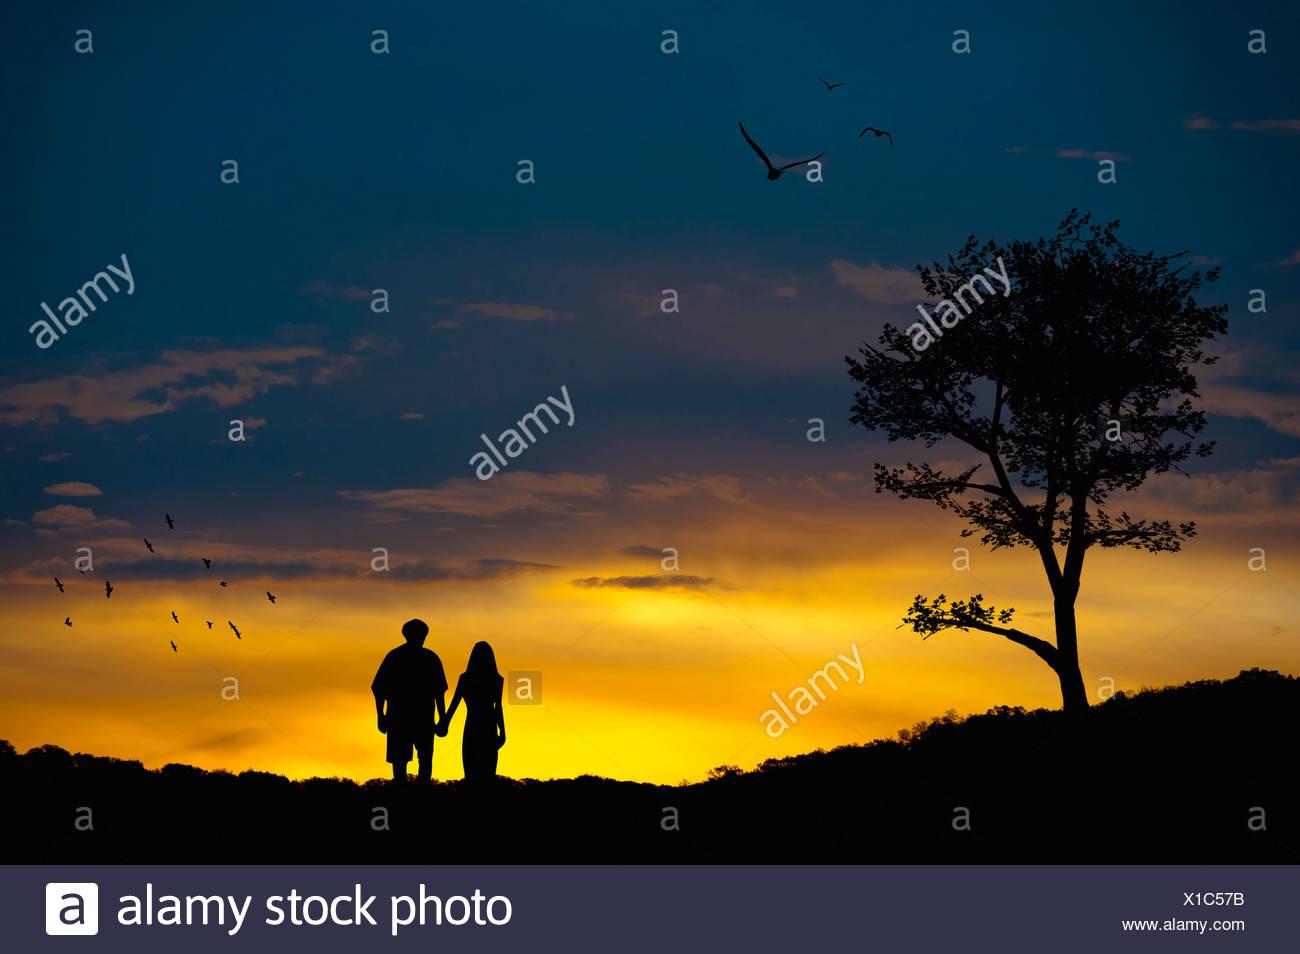 Pareja de amor al paisaje romántico Imagen De Stock